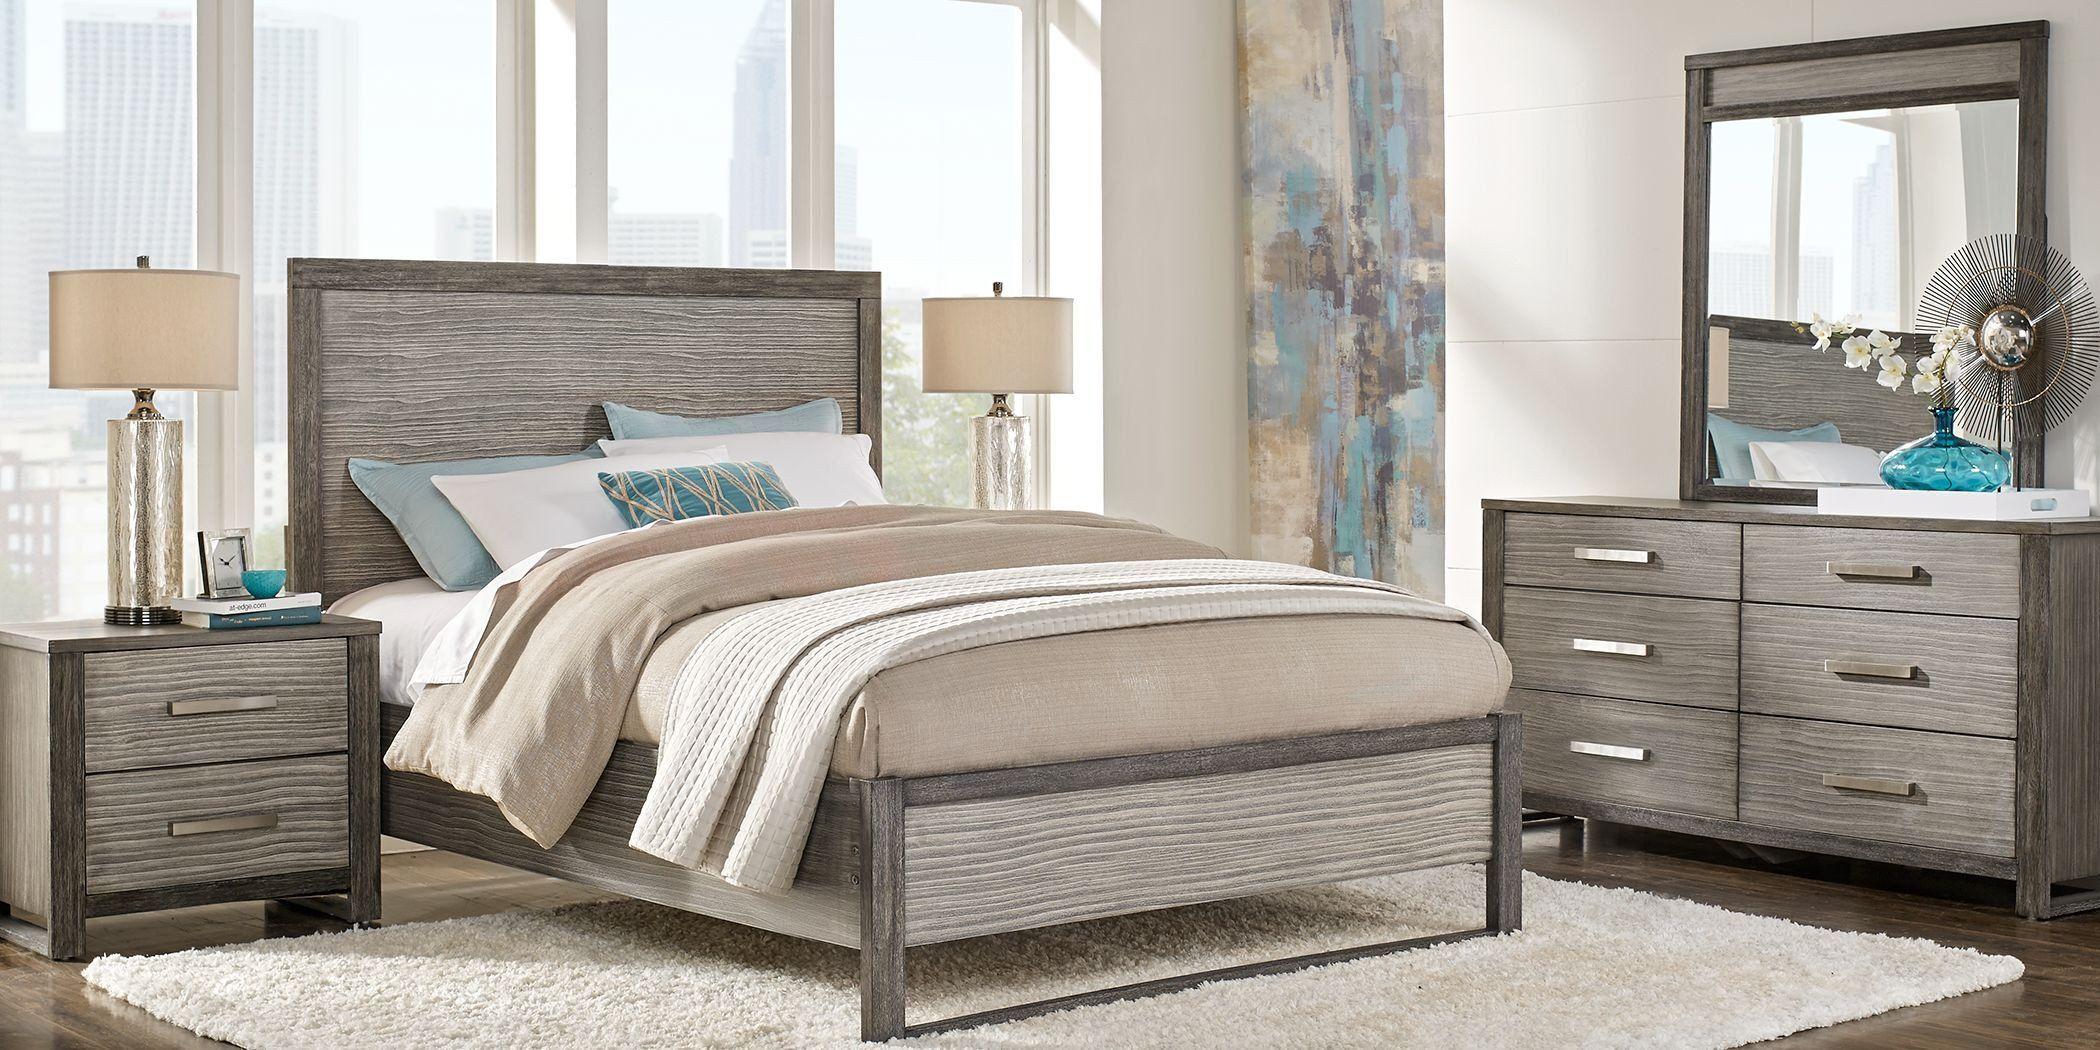 Rooms to Go Bedroom Set King Discount Bedroom Furniture Rooms to